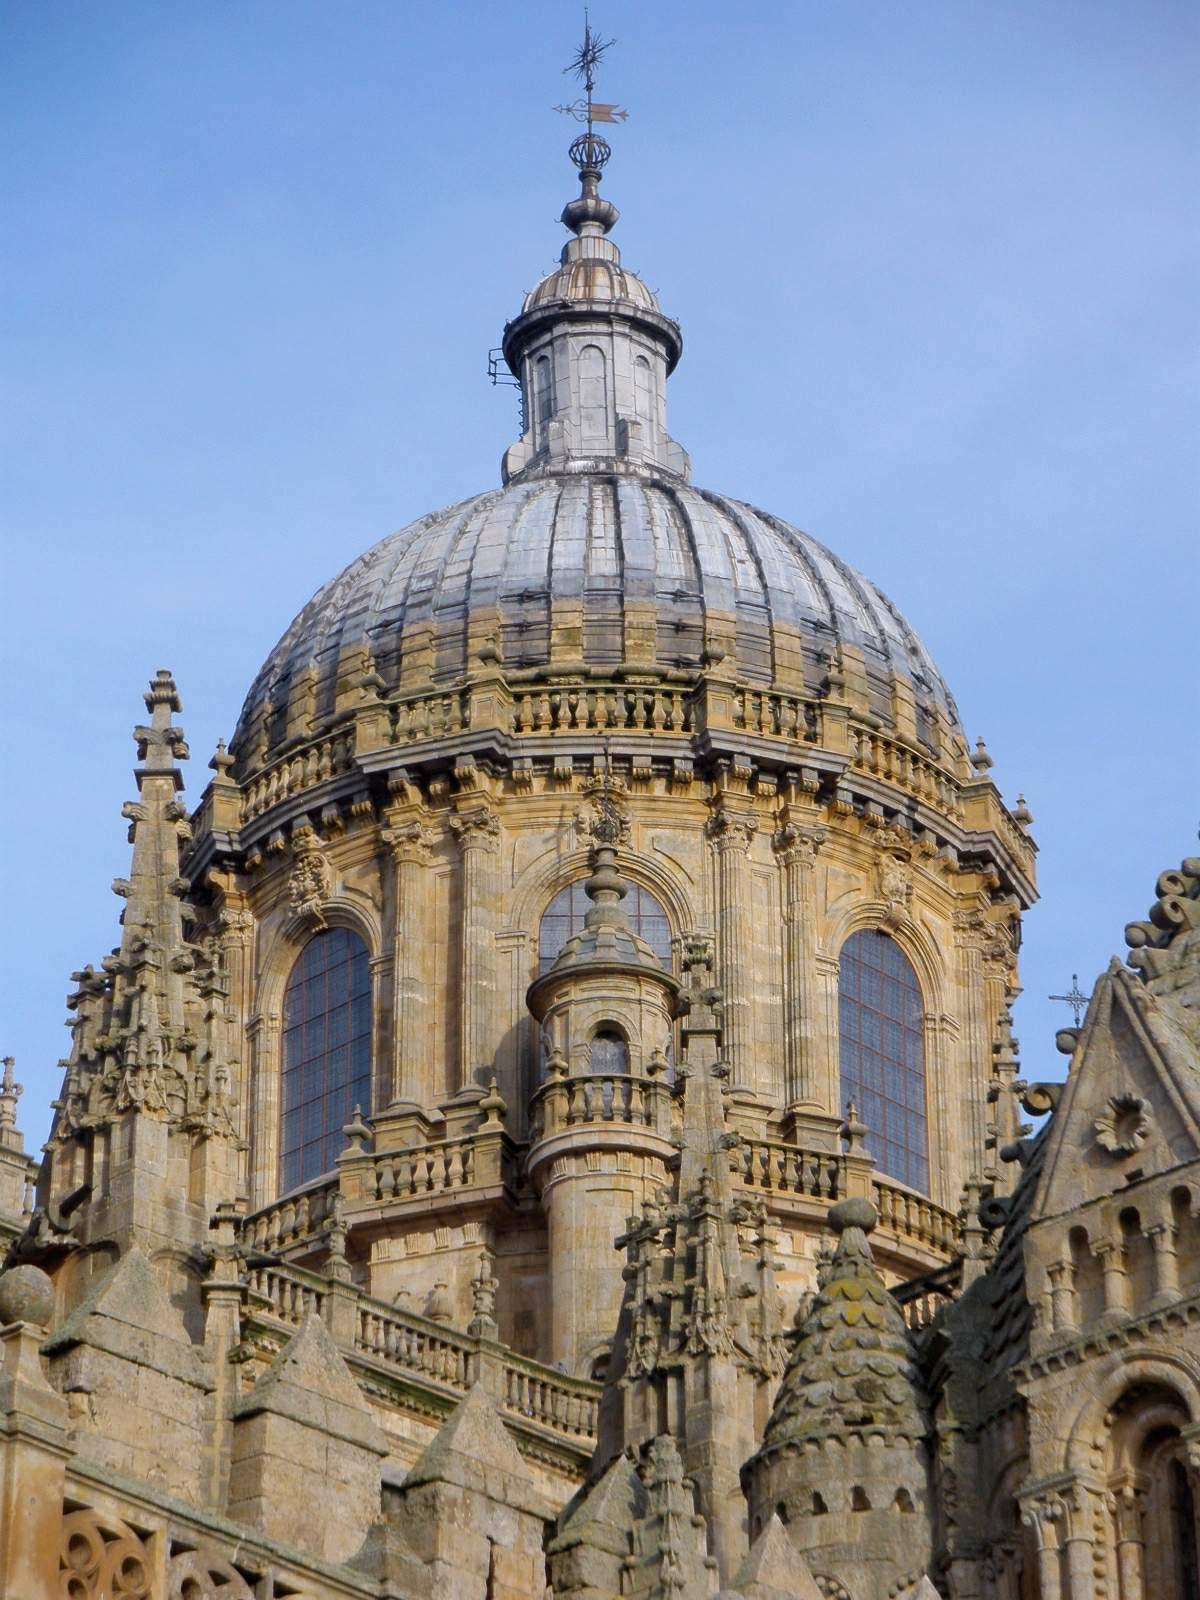 File:Salamanca - Catedral Nueva, exterior 14.jpg - Wikimedia Commons